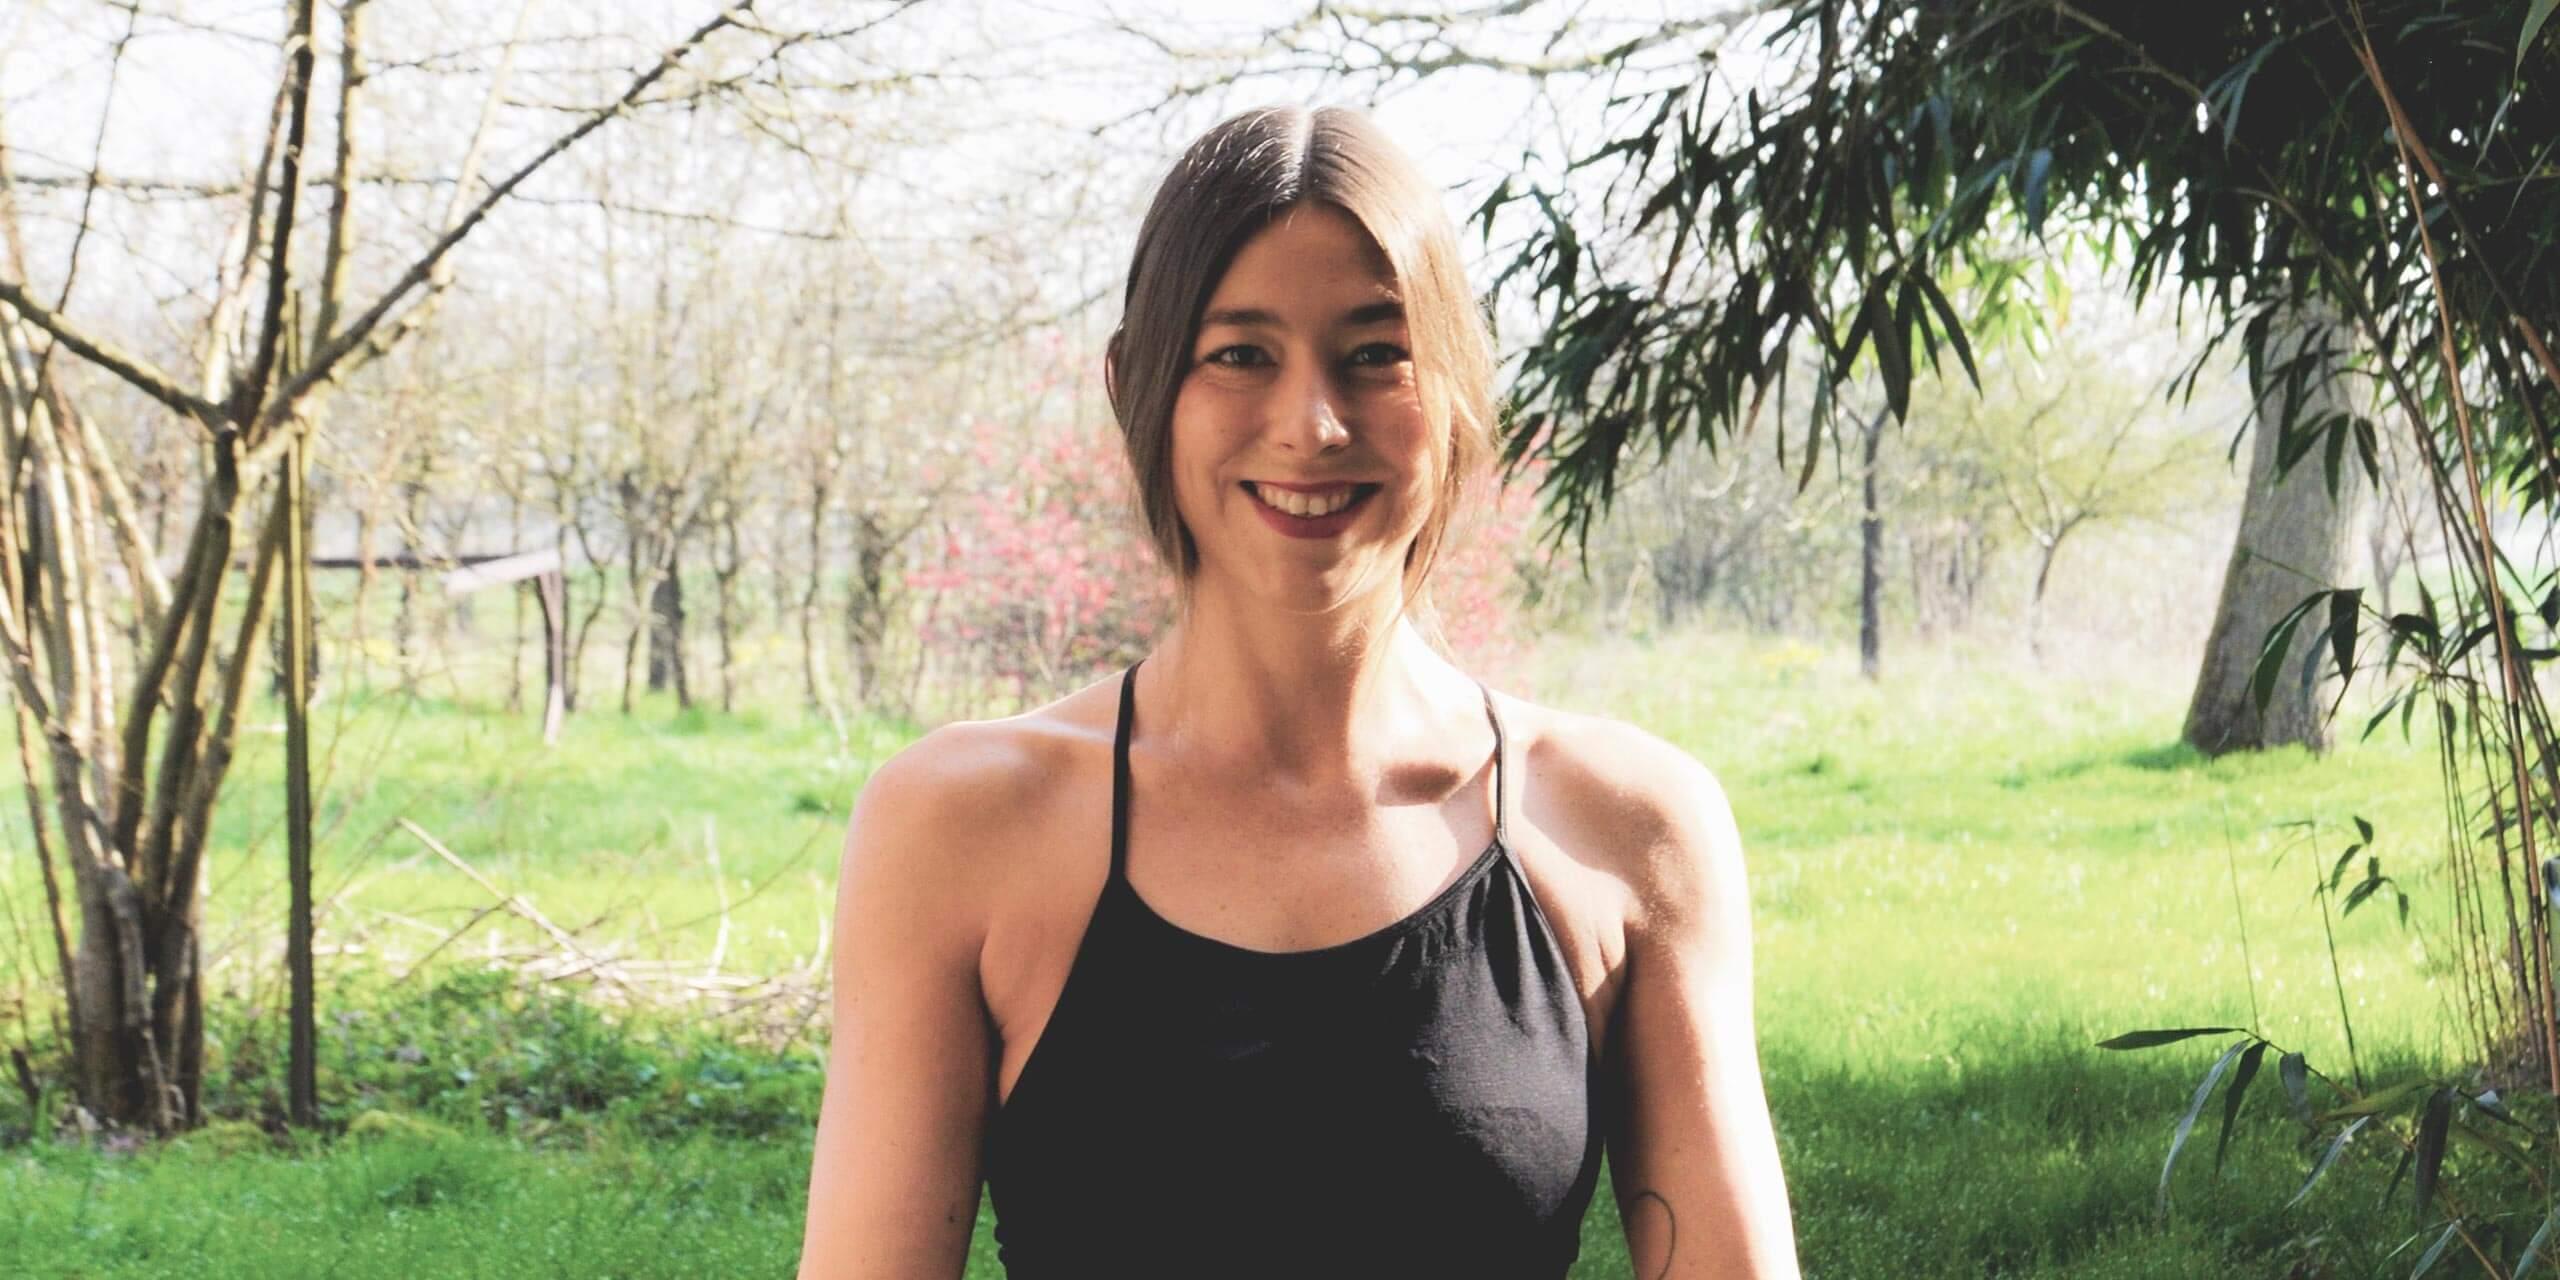 Roomers Baden-Baden Yoga Retreat Schwarzwald Gianna Thiess